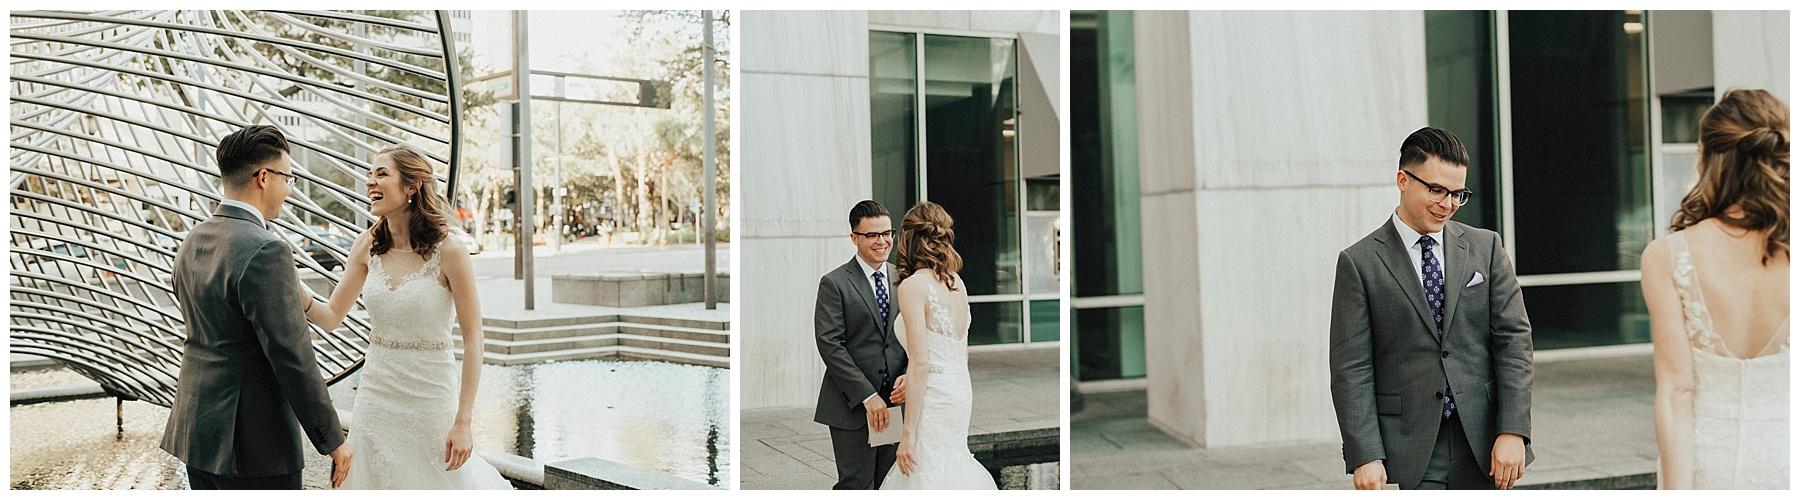 Kylie Garden Wedding Tampa Wedding Photographer-36.jpg